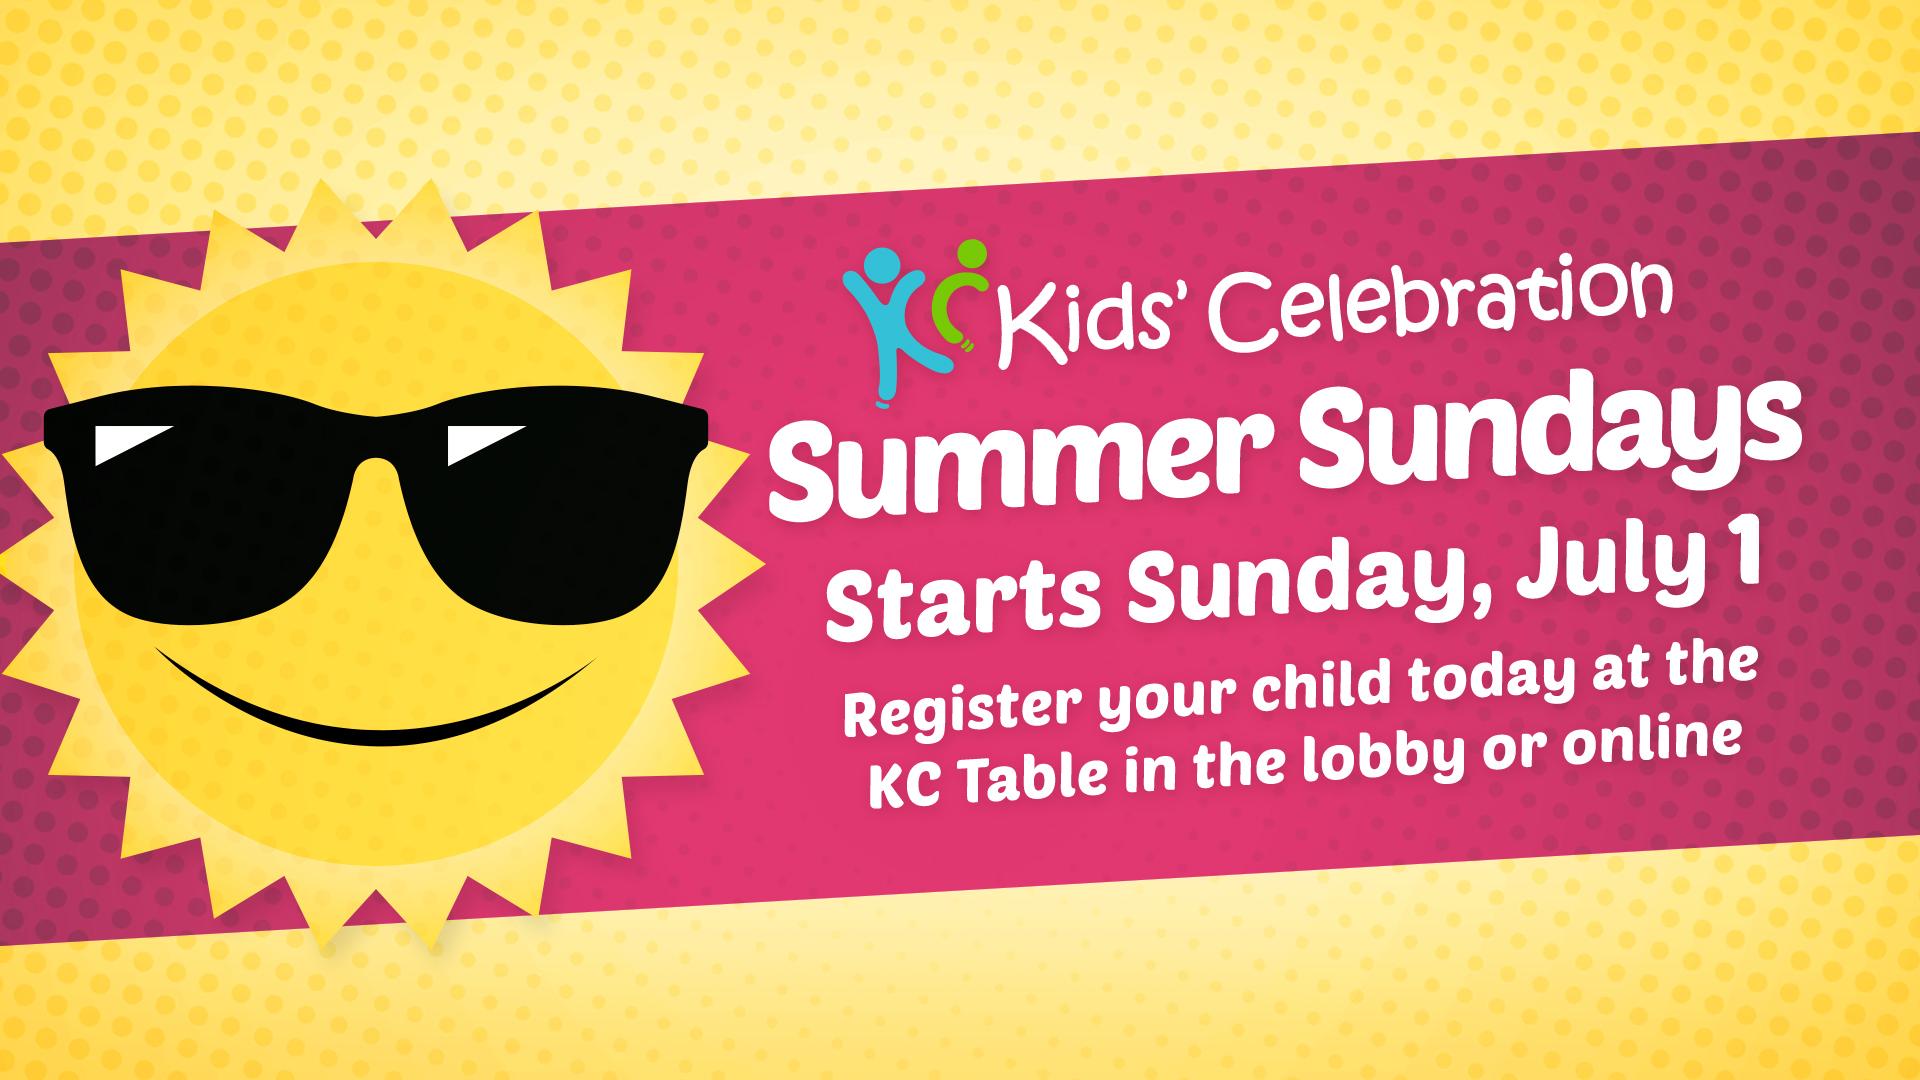 Halfmoon Kids' Celebration Summer Sundays